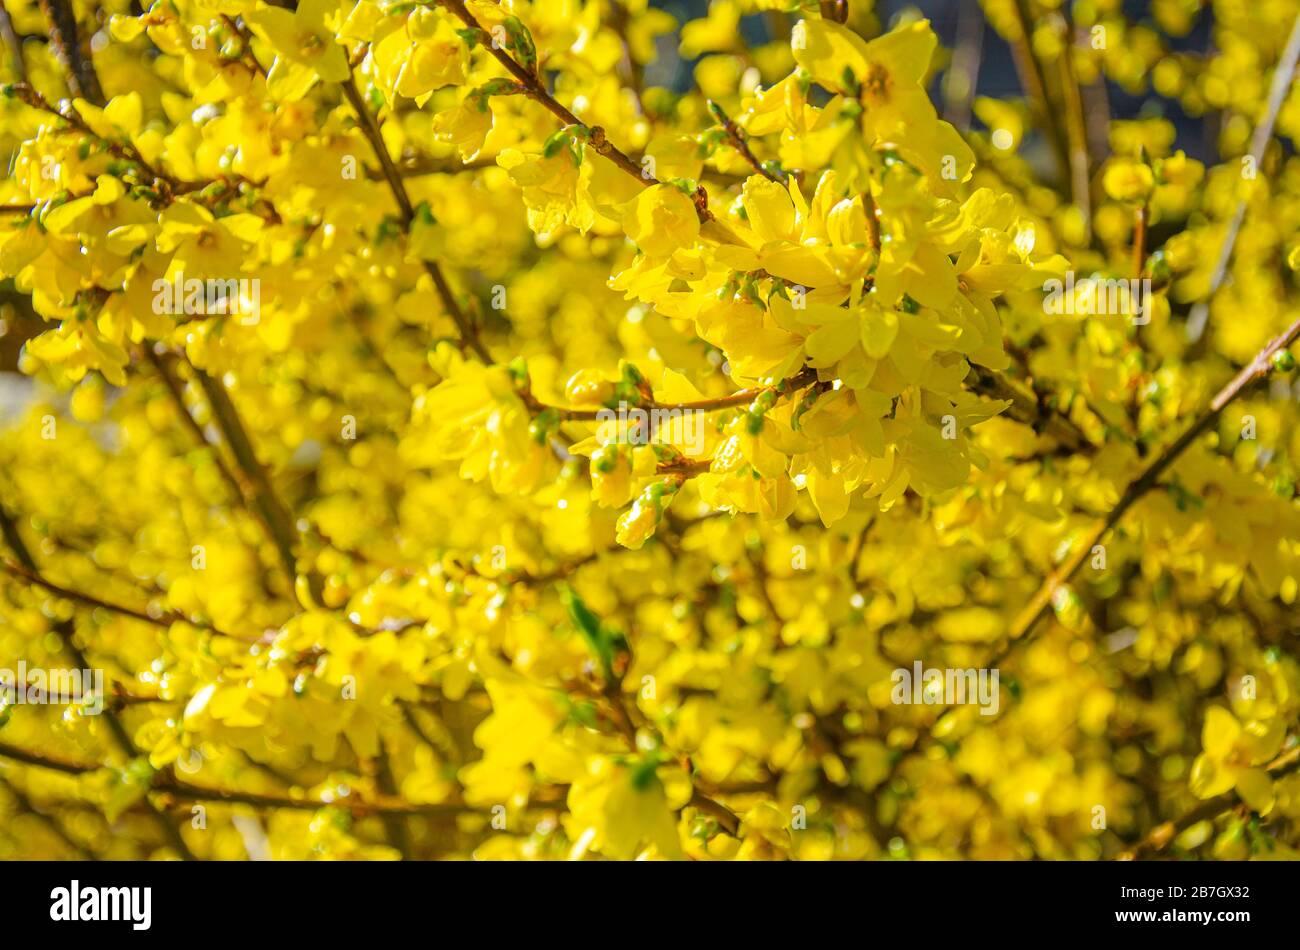 forsythia-is-a-spring-flowering-shrub-with-yellow-flowers-2B7GX32.jpg